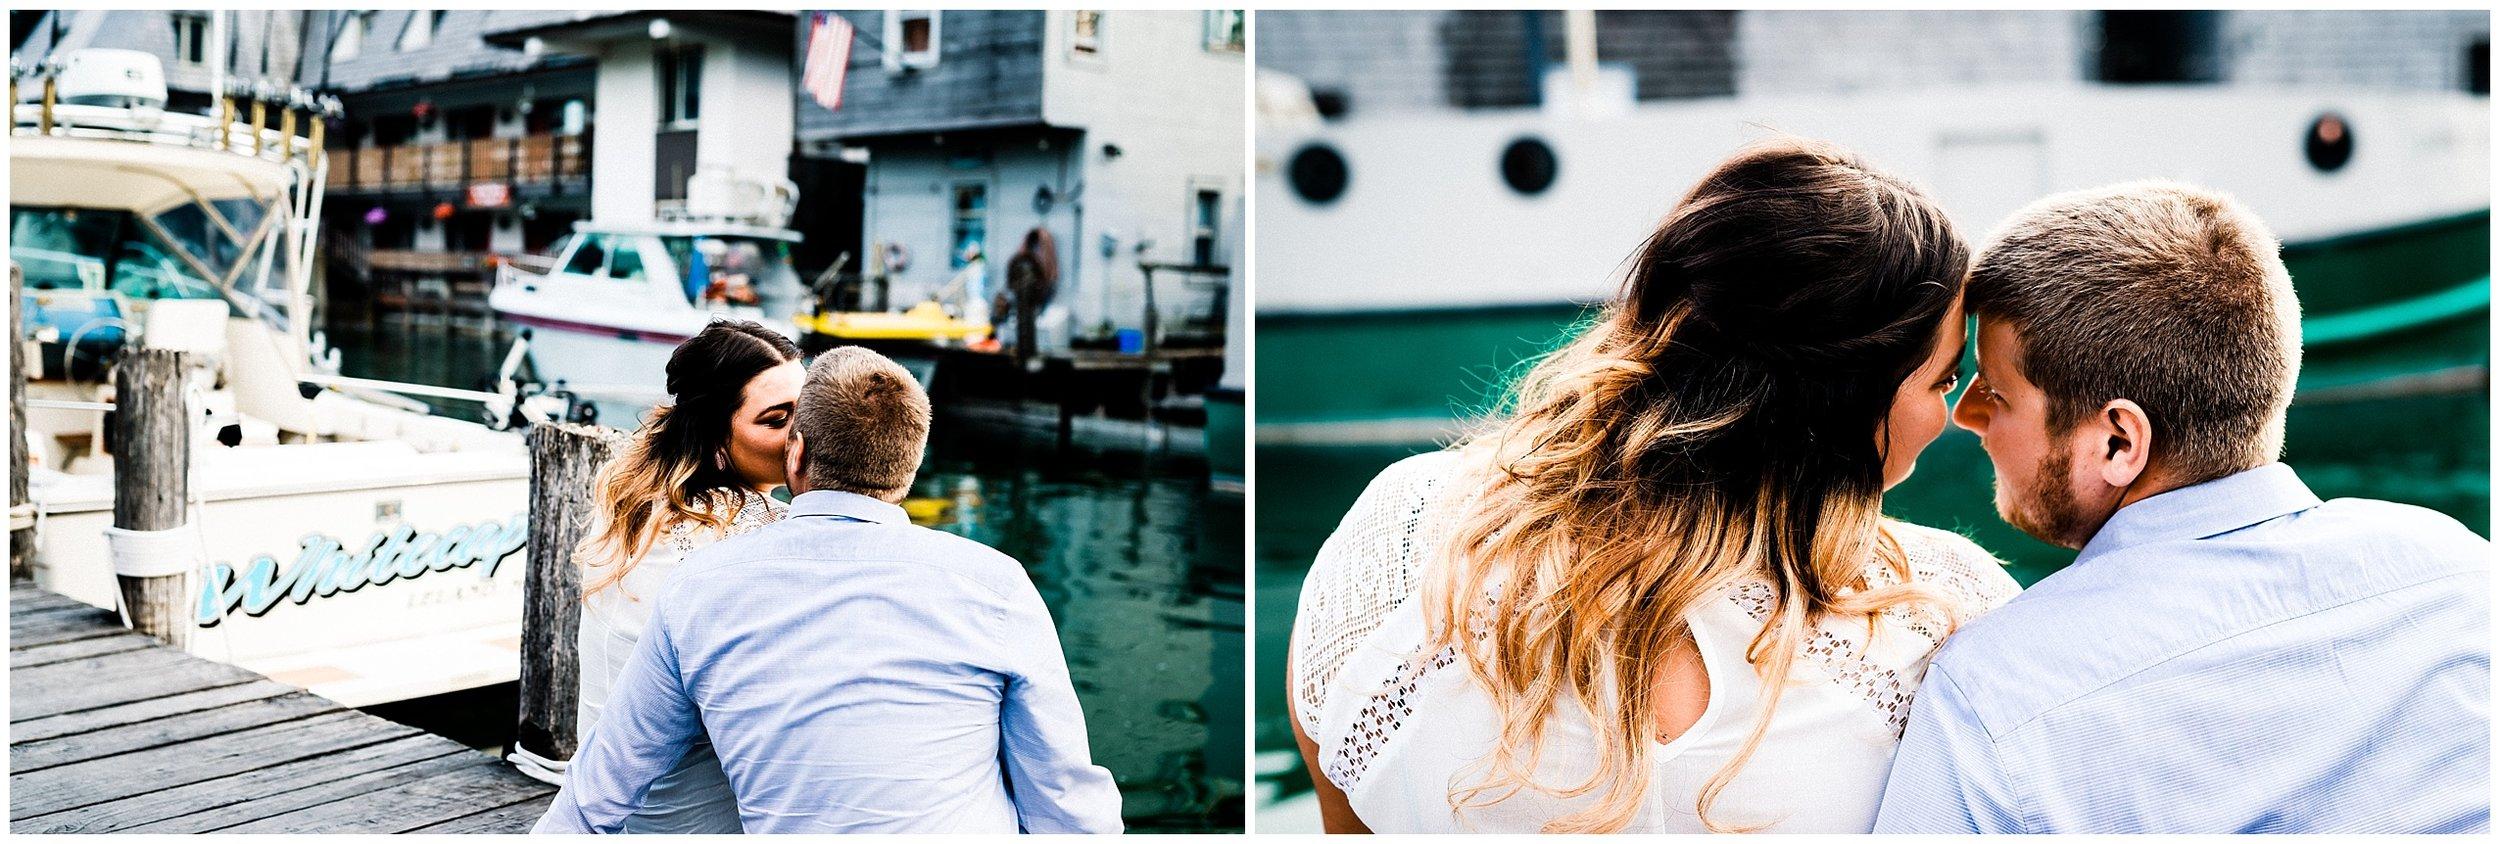 Kyle + Emily | Engaged #kyleepaigephotography_0493.jpg